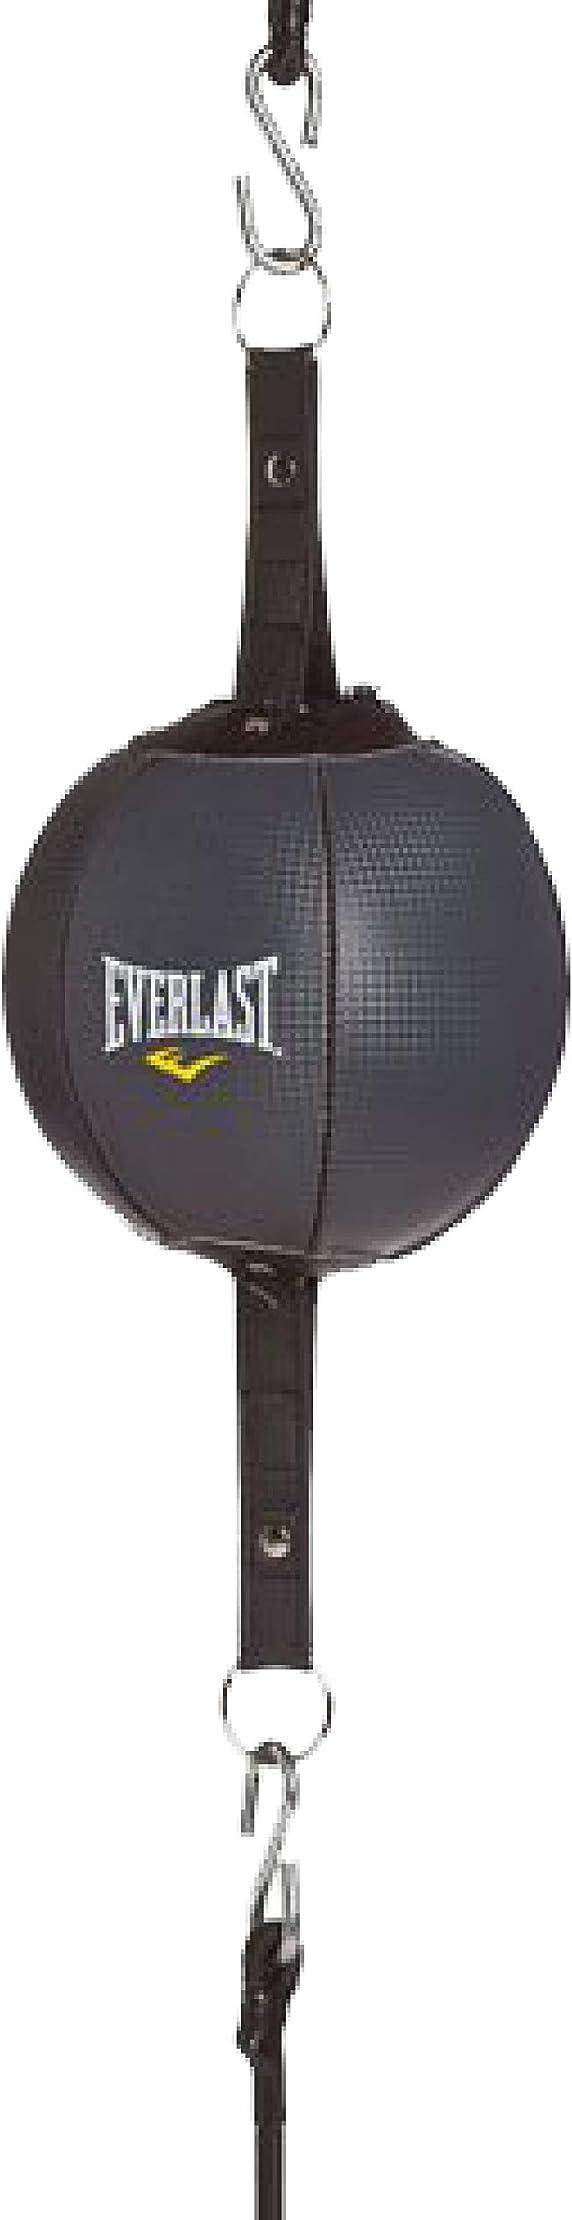 Palla boxe everhide everlast double end striking bag 1281897